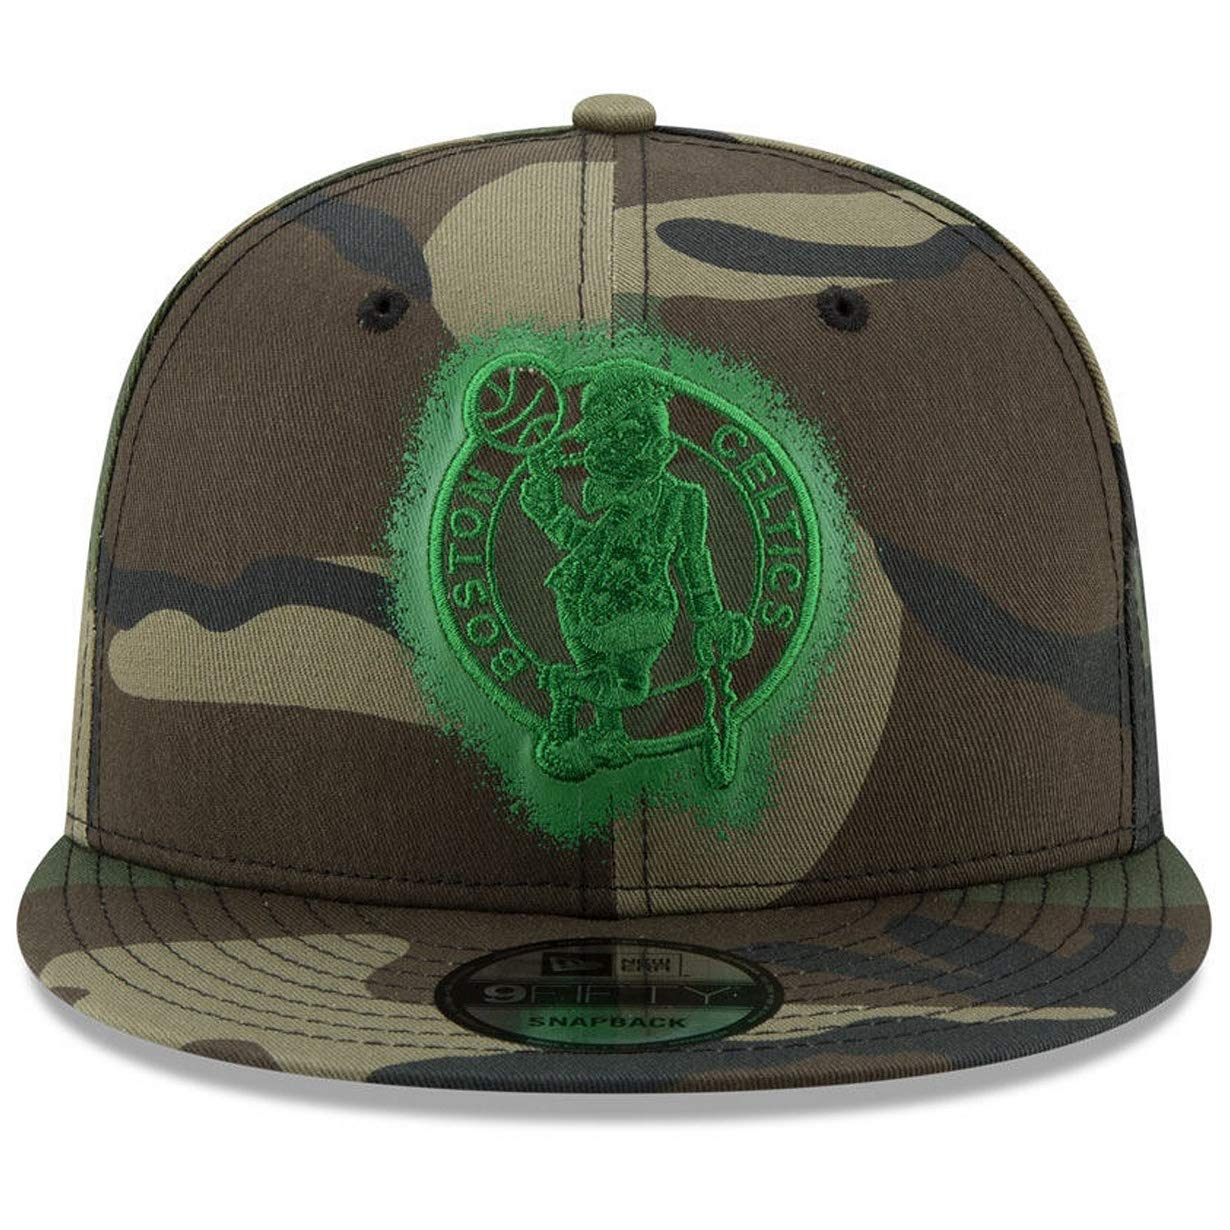 pretty nice ef0e3 90f1f New Era Boston Celtics 9FIFTY Overspray Snapback Cap NBA, Hat Camo at  Amazon Men s Clothing store